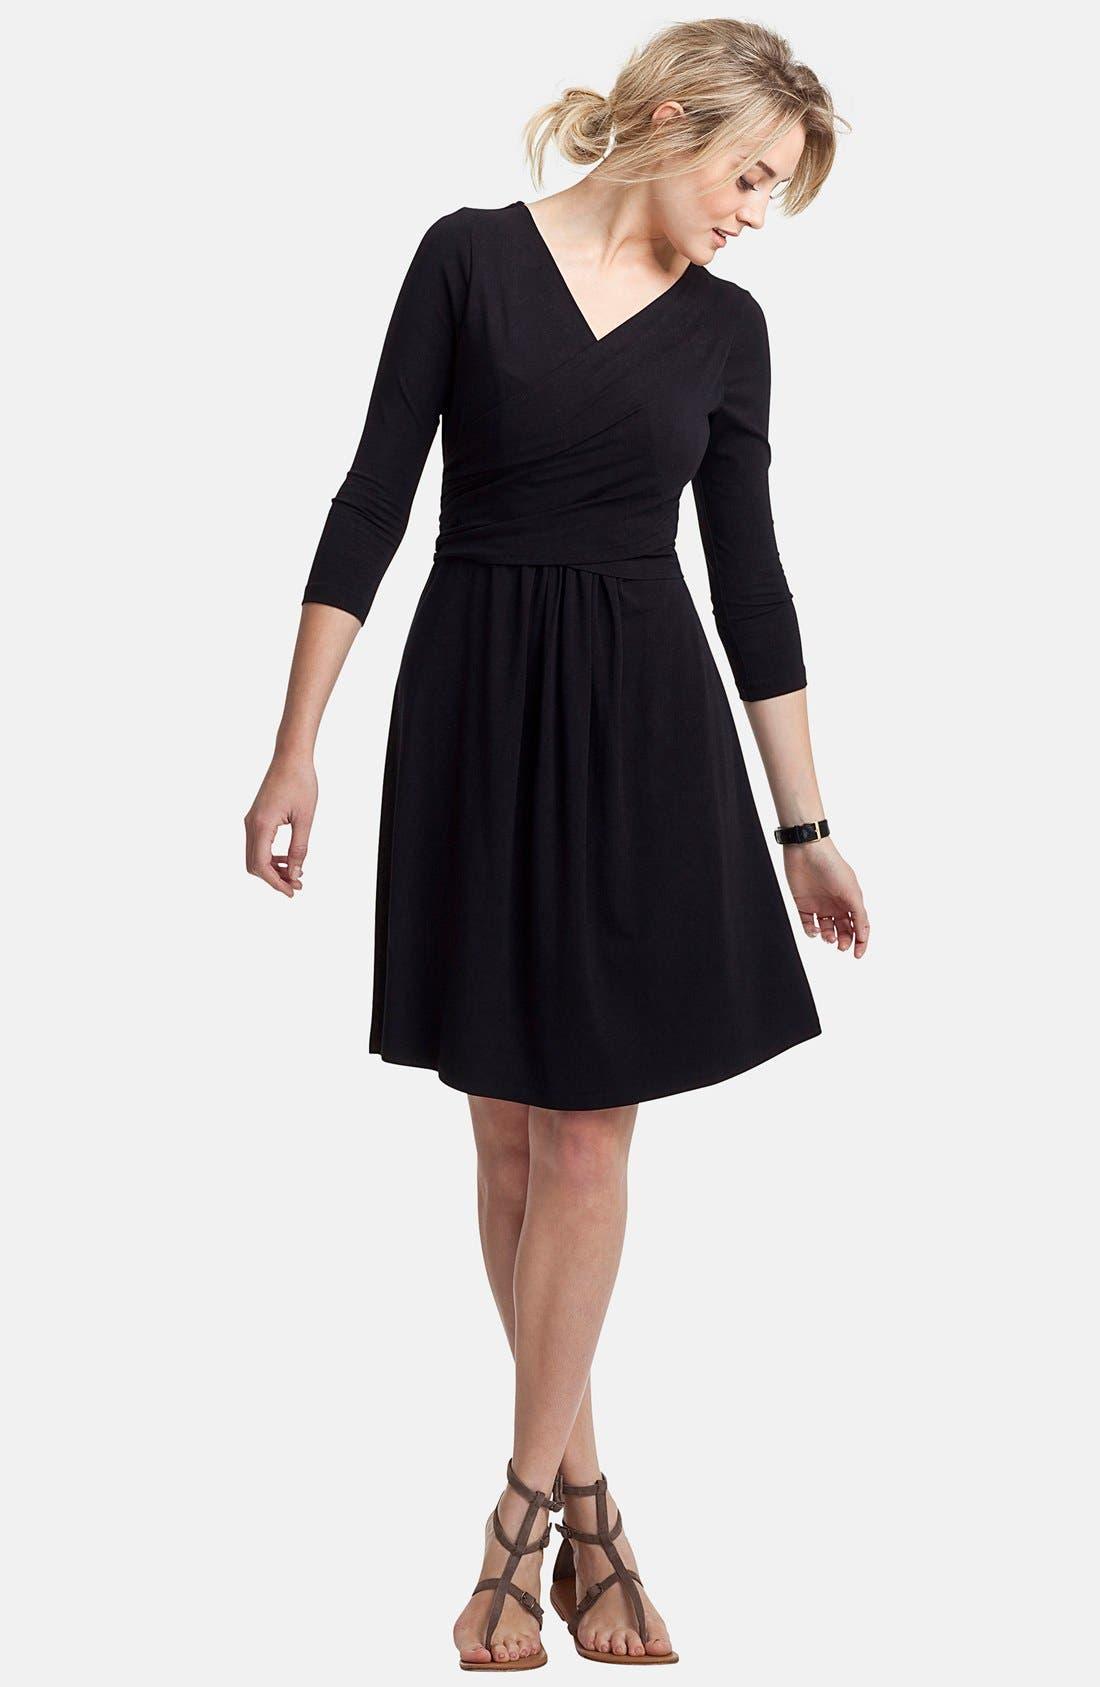 ISABELLA OLIVER,                             'Avebury' Nursing Wrap Maternity Dress,                             Alternate thumbnail 5, color,                             001